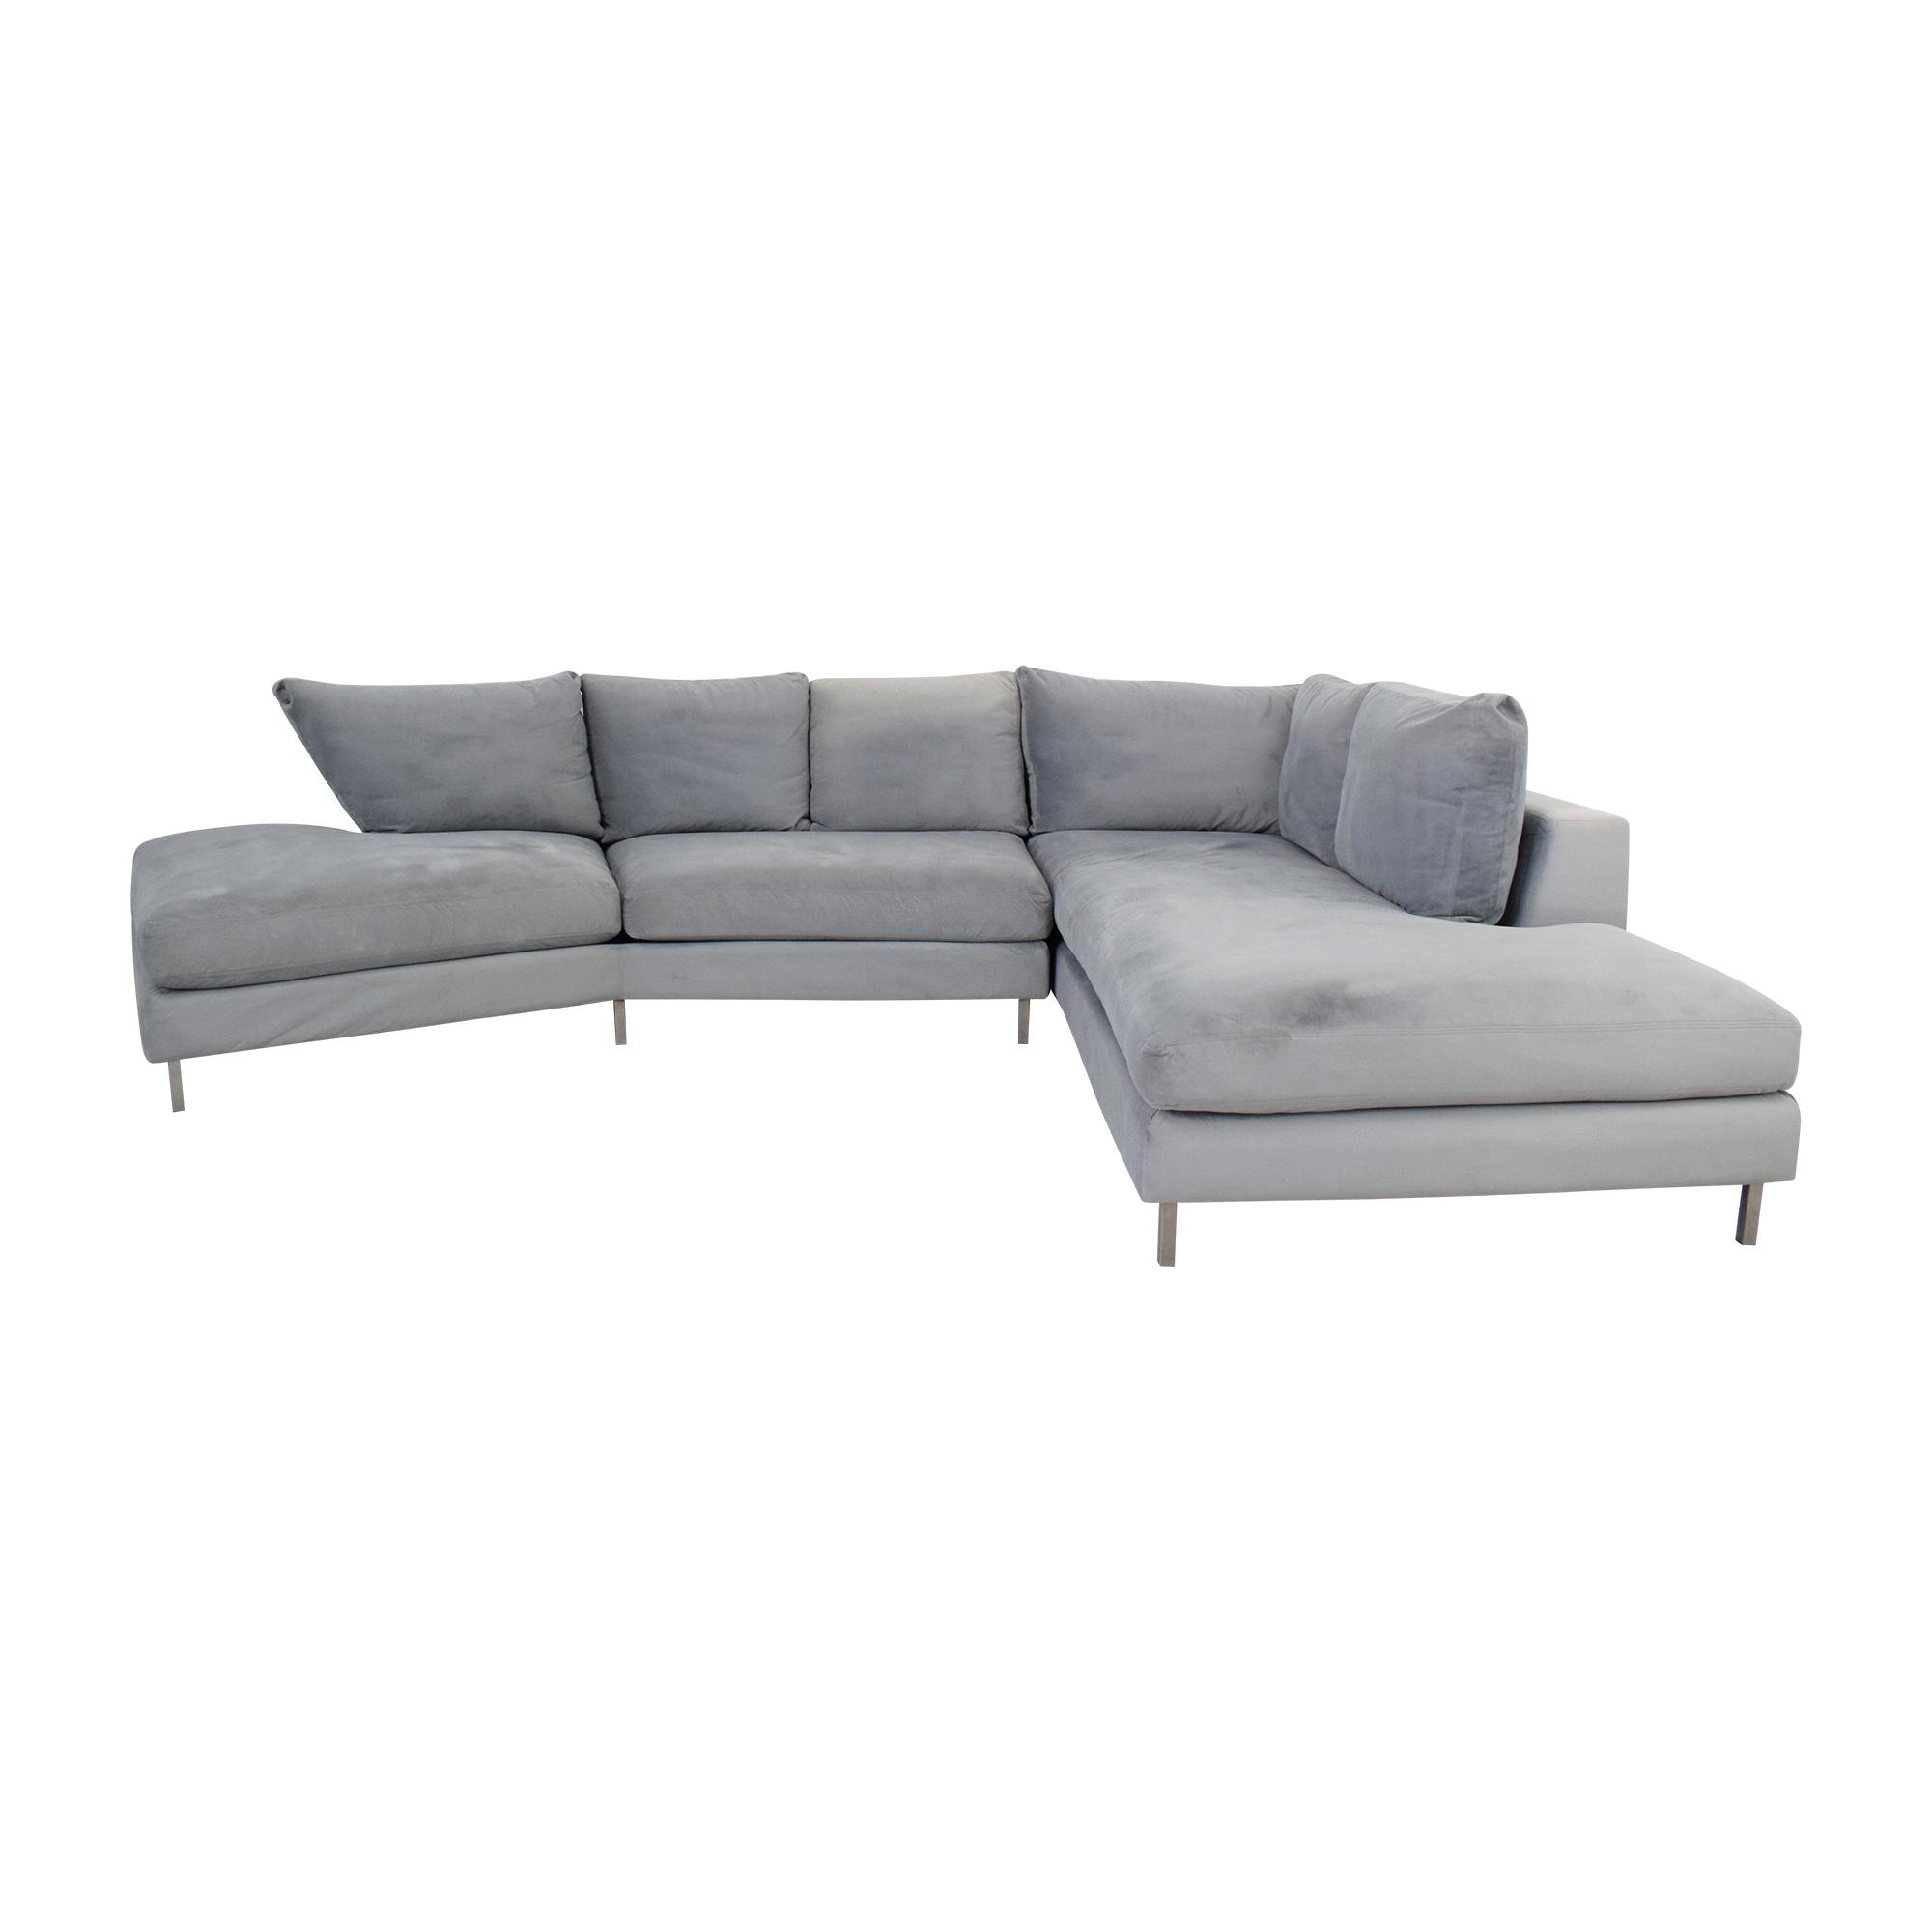 Room & Board Room & Board Hayes Angled Sectional Sofa nyc